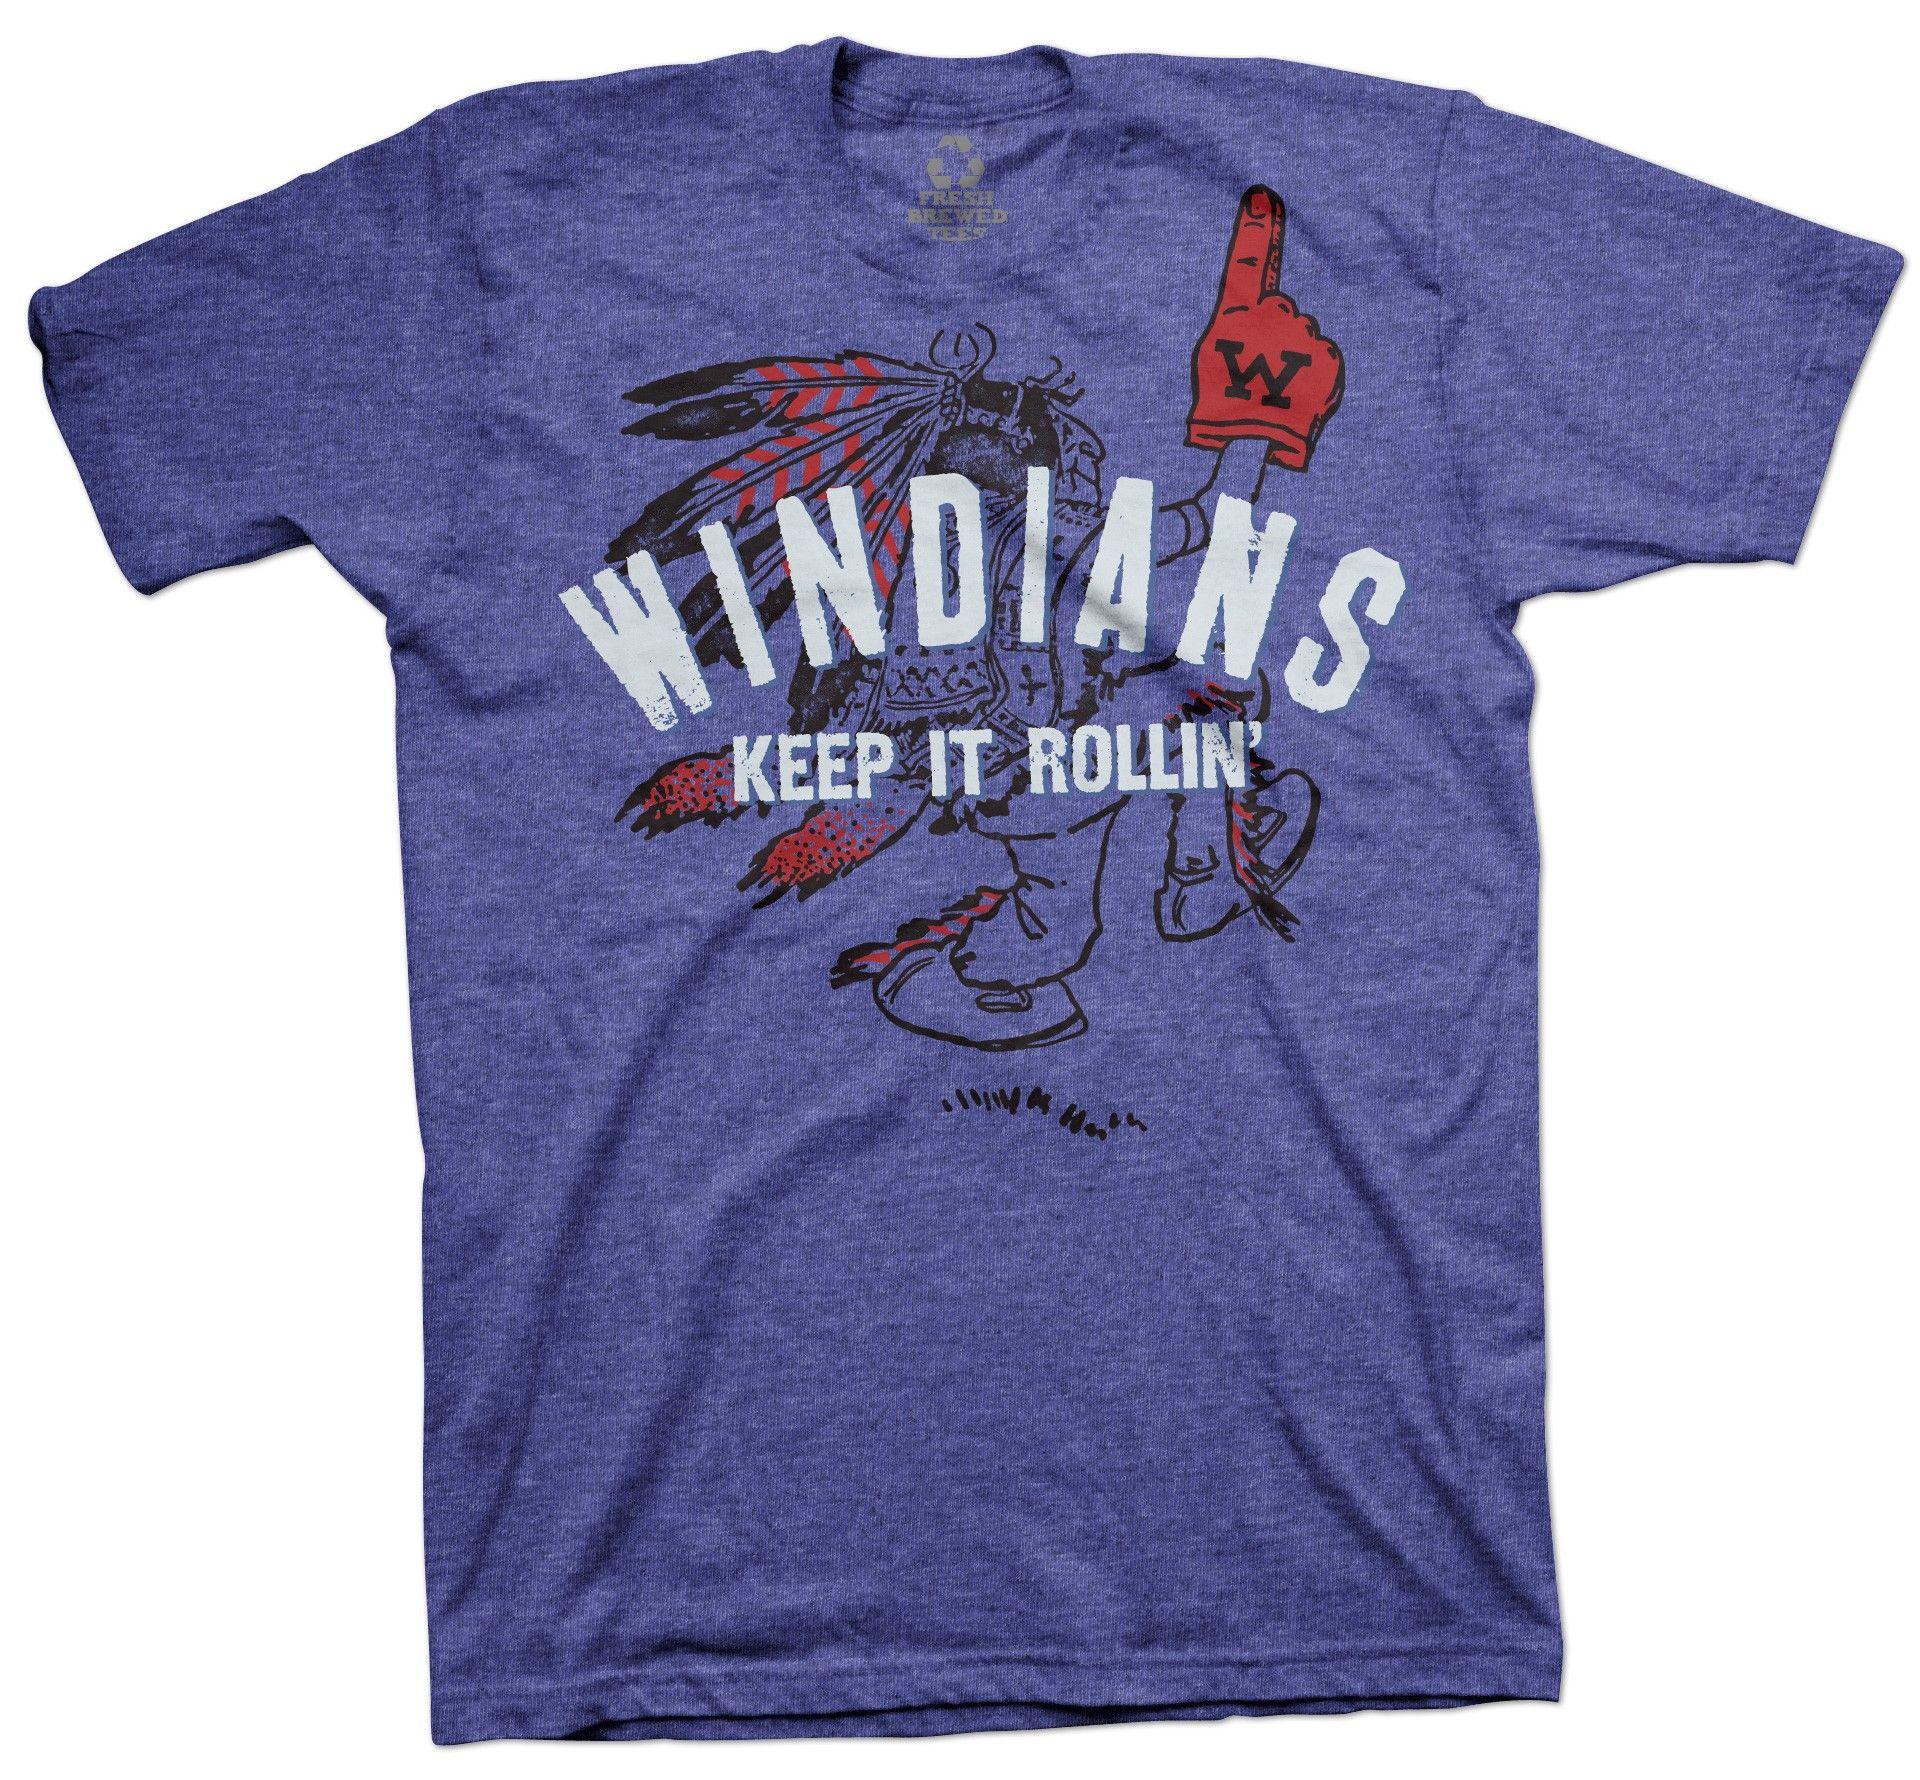 Official Cleveland Windians T-Shirt #indians #windians #cleveland www.freshbrewedtees.com